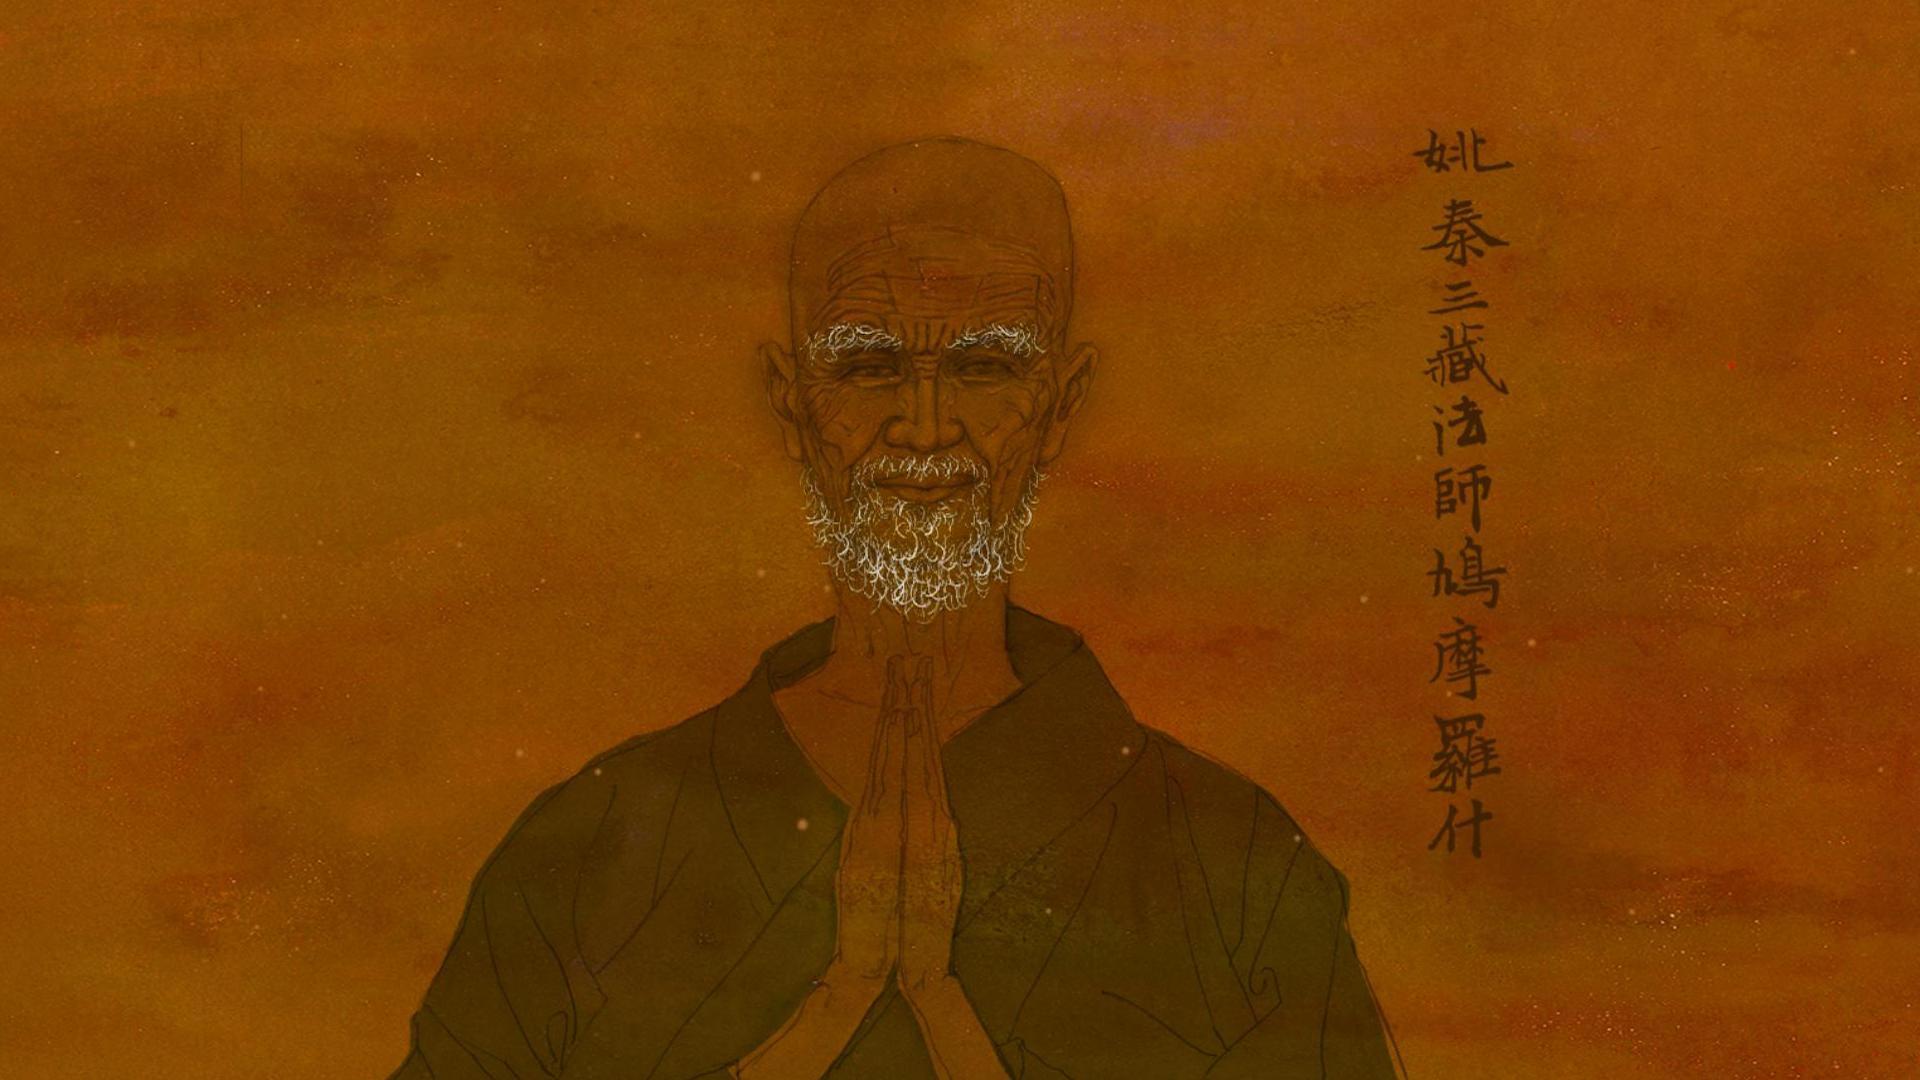 The Silk Road Walker-Kumarajiva